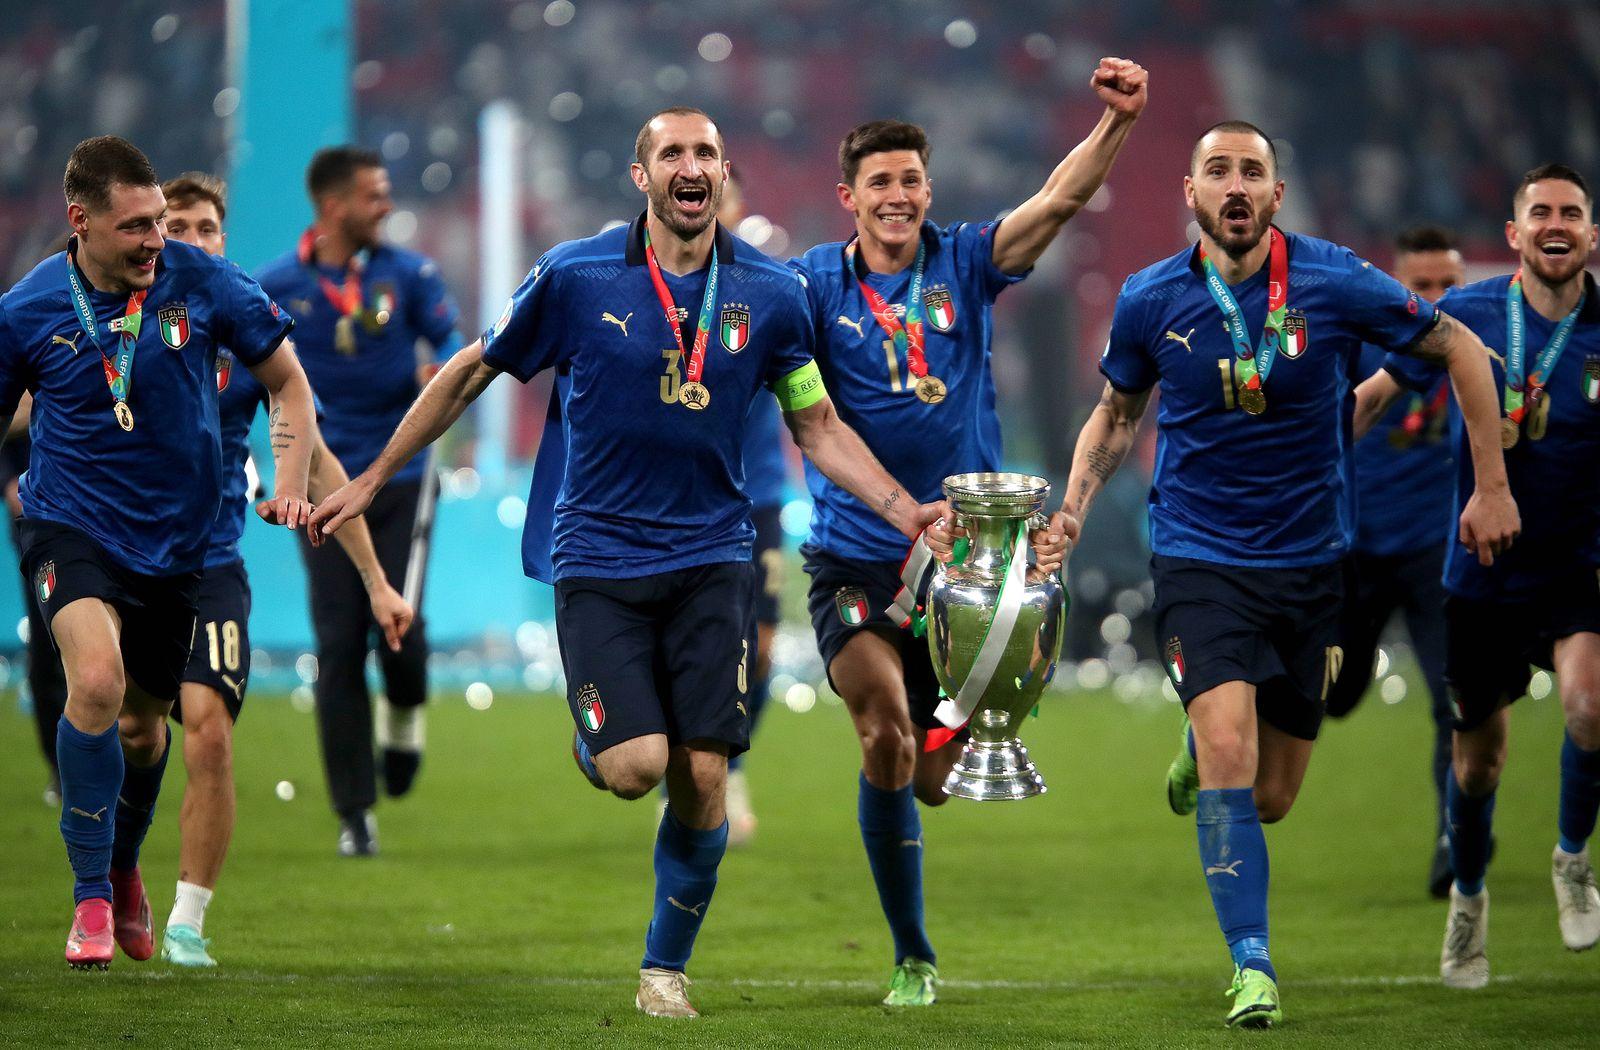 Italy v England - UEFA EURO, EM, Europameisterschaft,Fussball 2020 Final - Wembley Stadium Italy s Giorgio Chiellini and